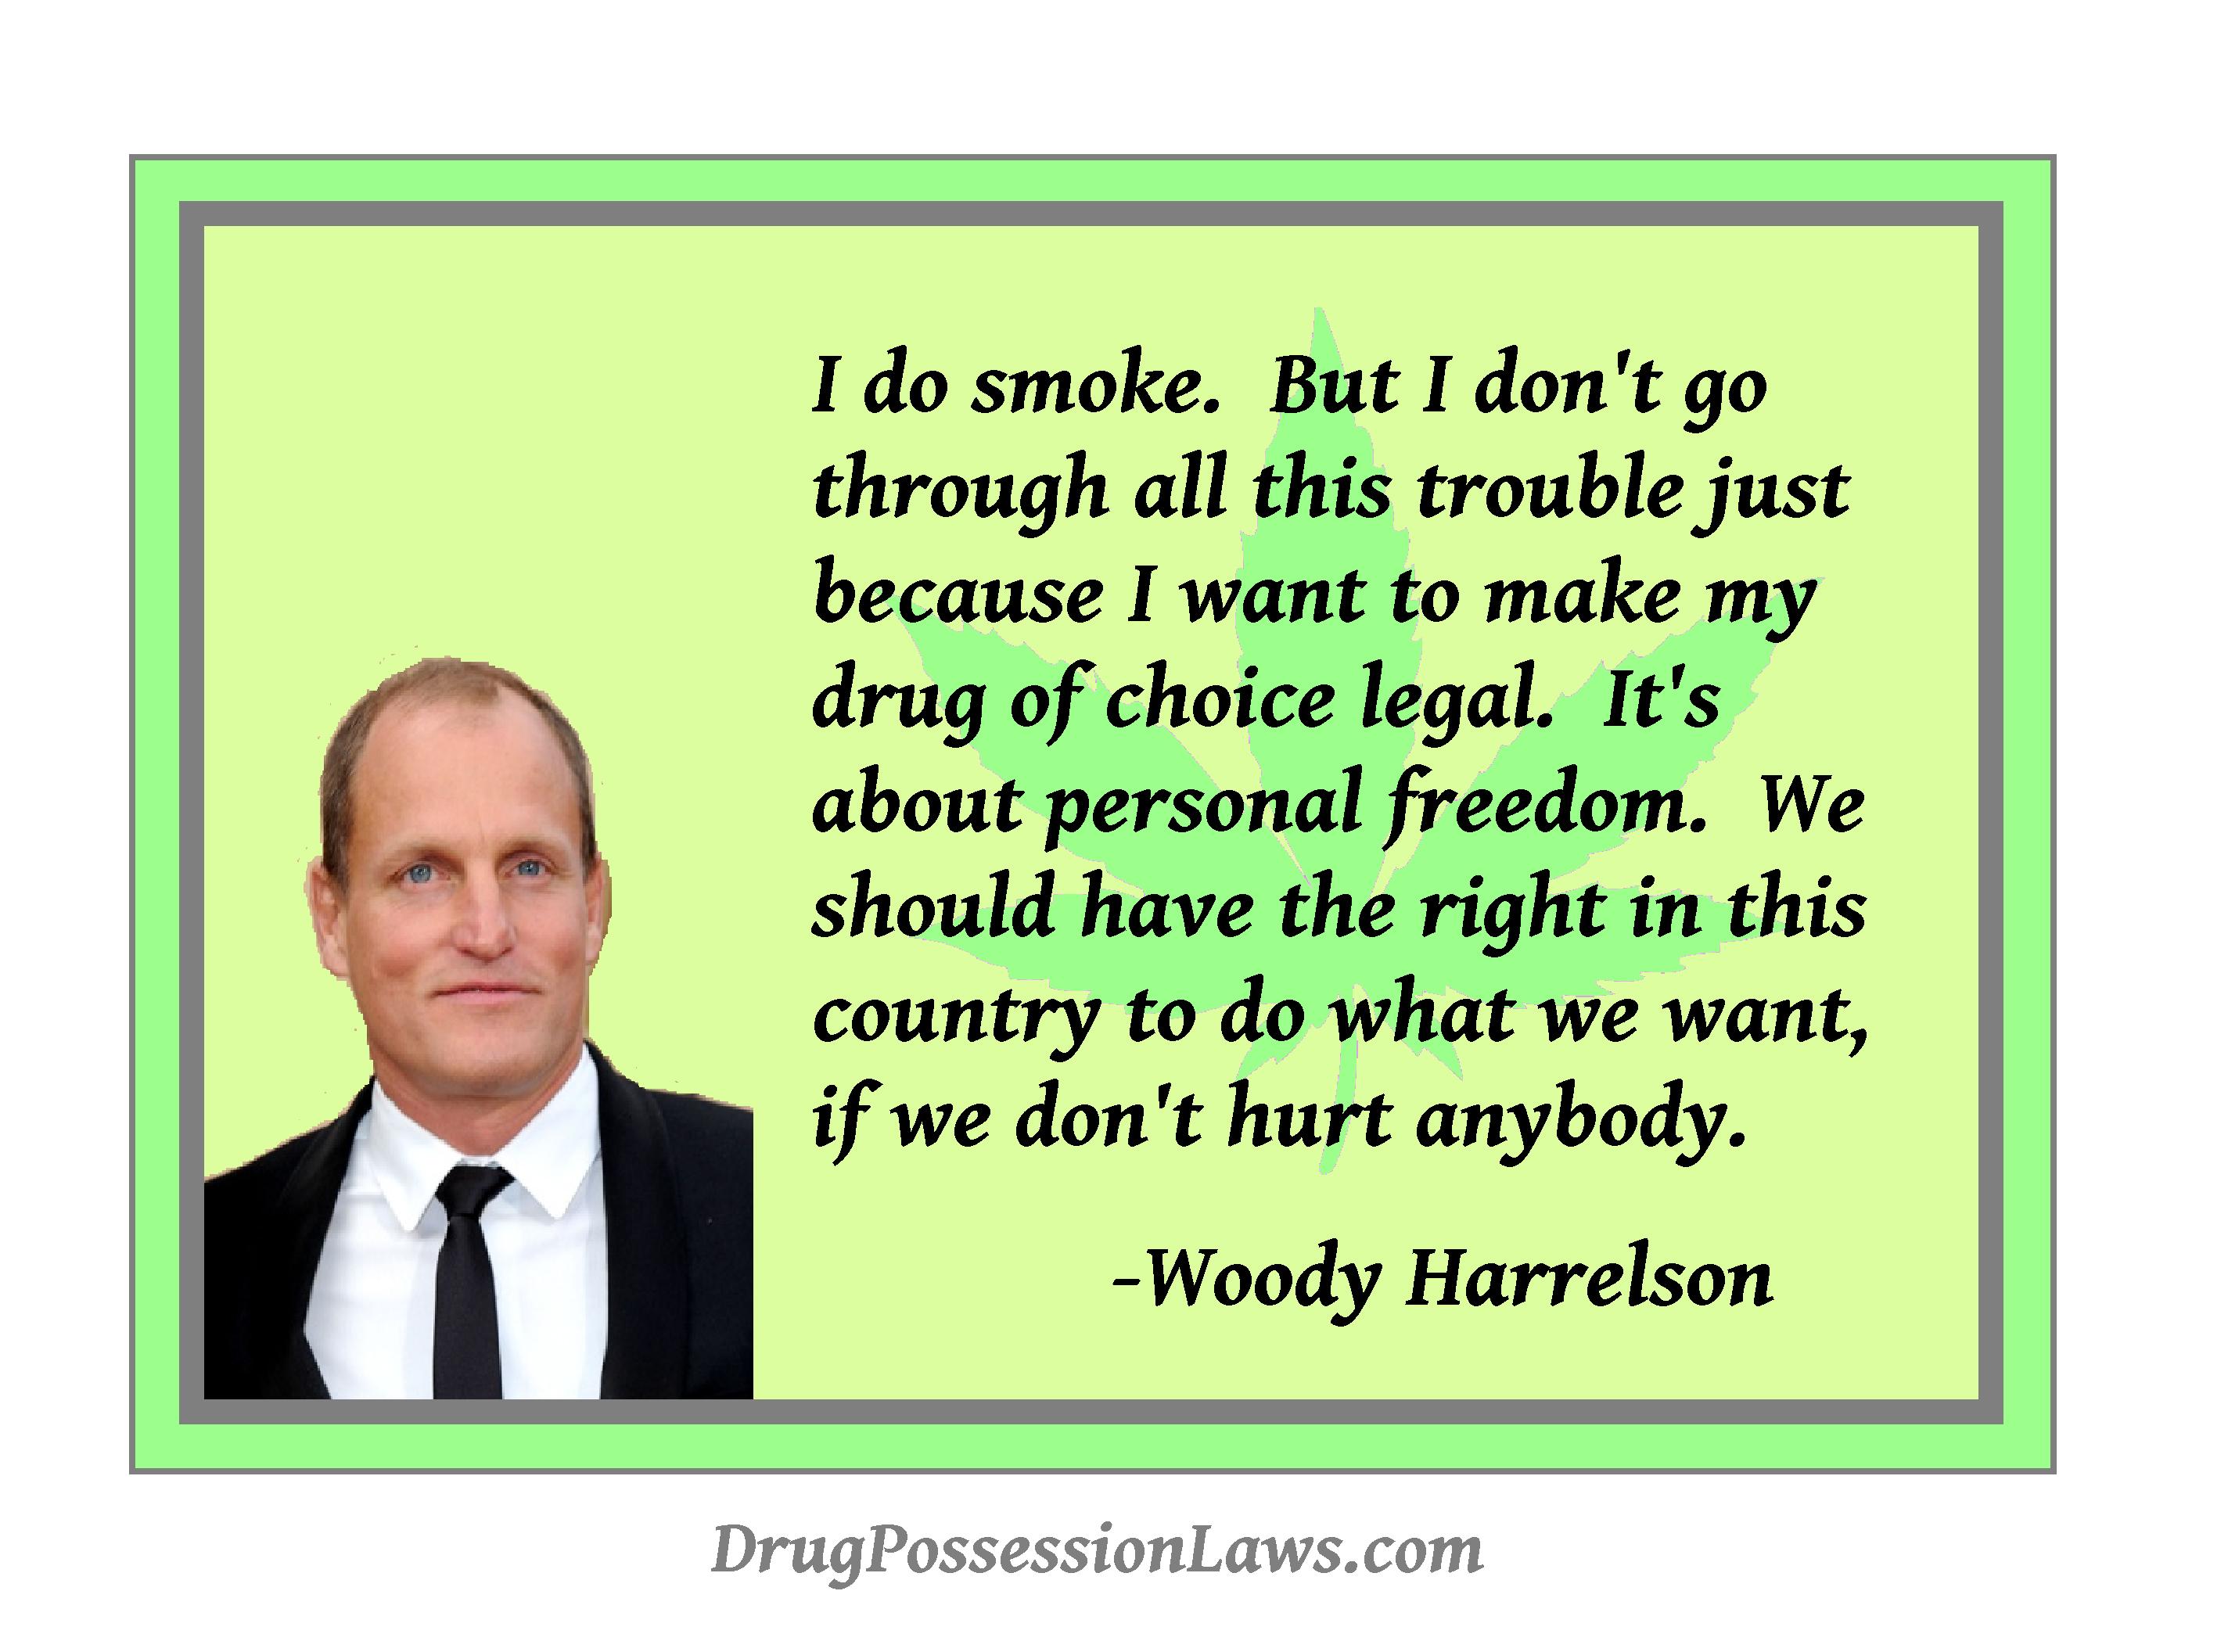 Woody Harrelson's quote #1